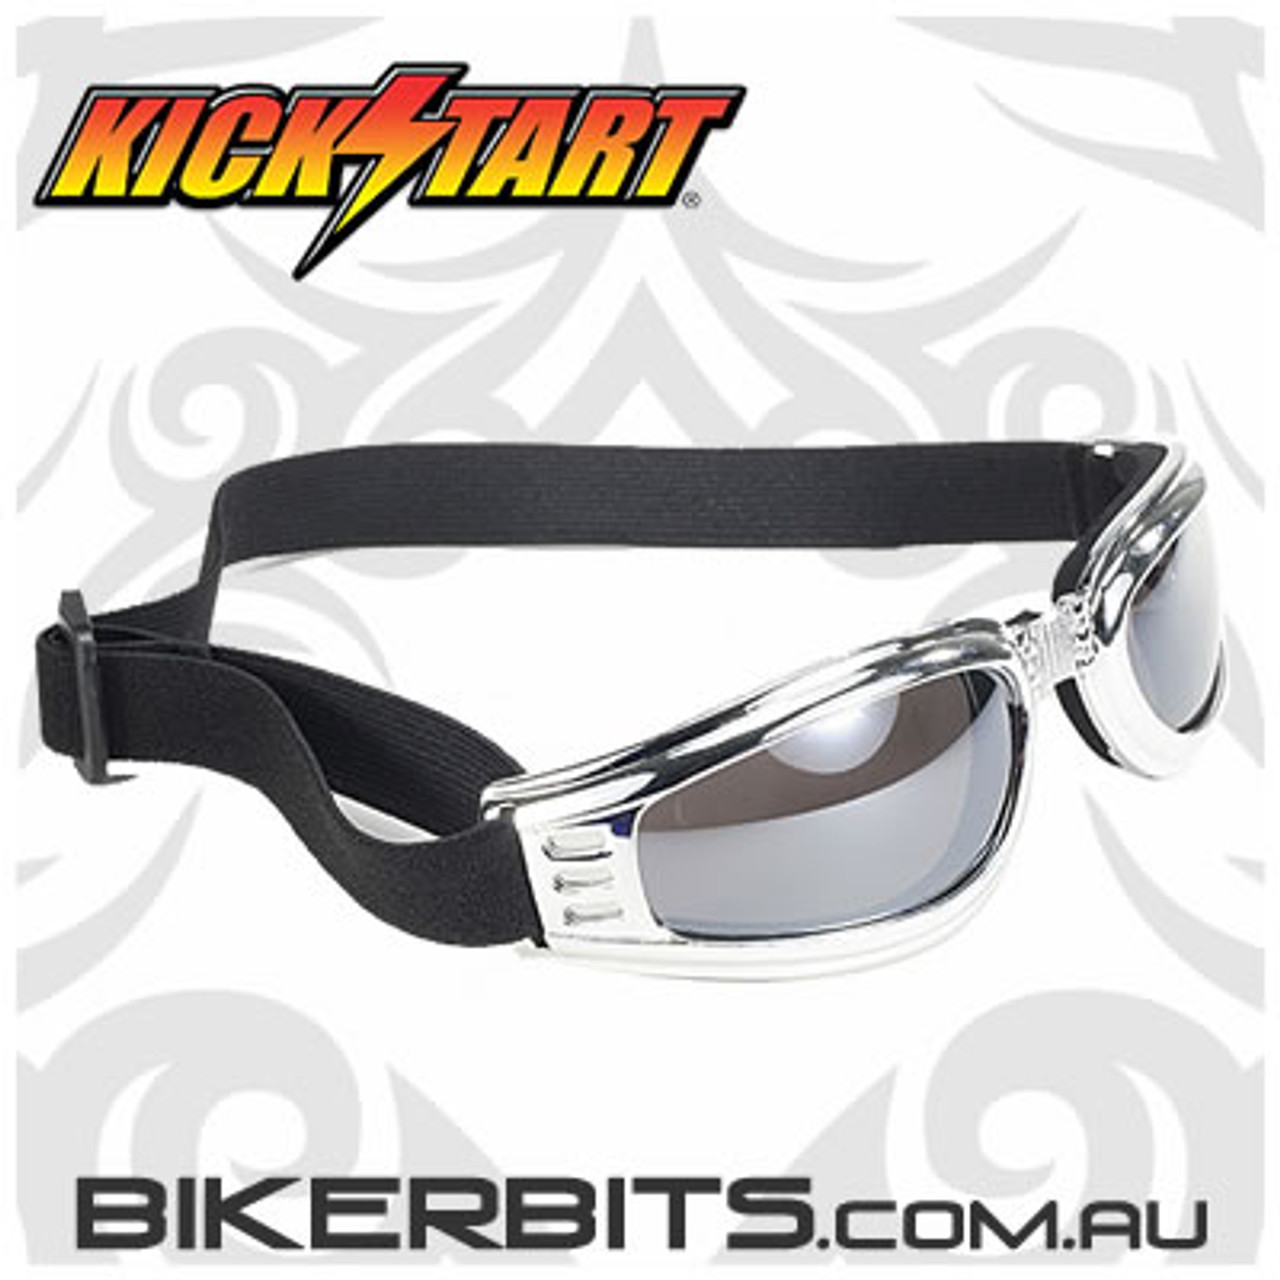 Motorcycle Goggles - Kickstart Nomad - Silver Mirror/Chrome